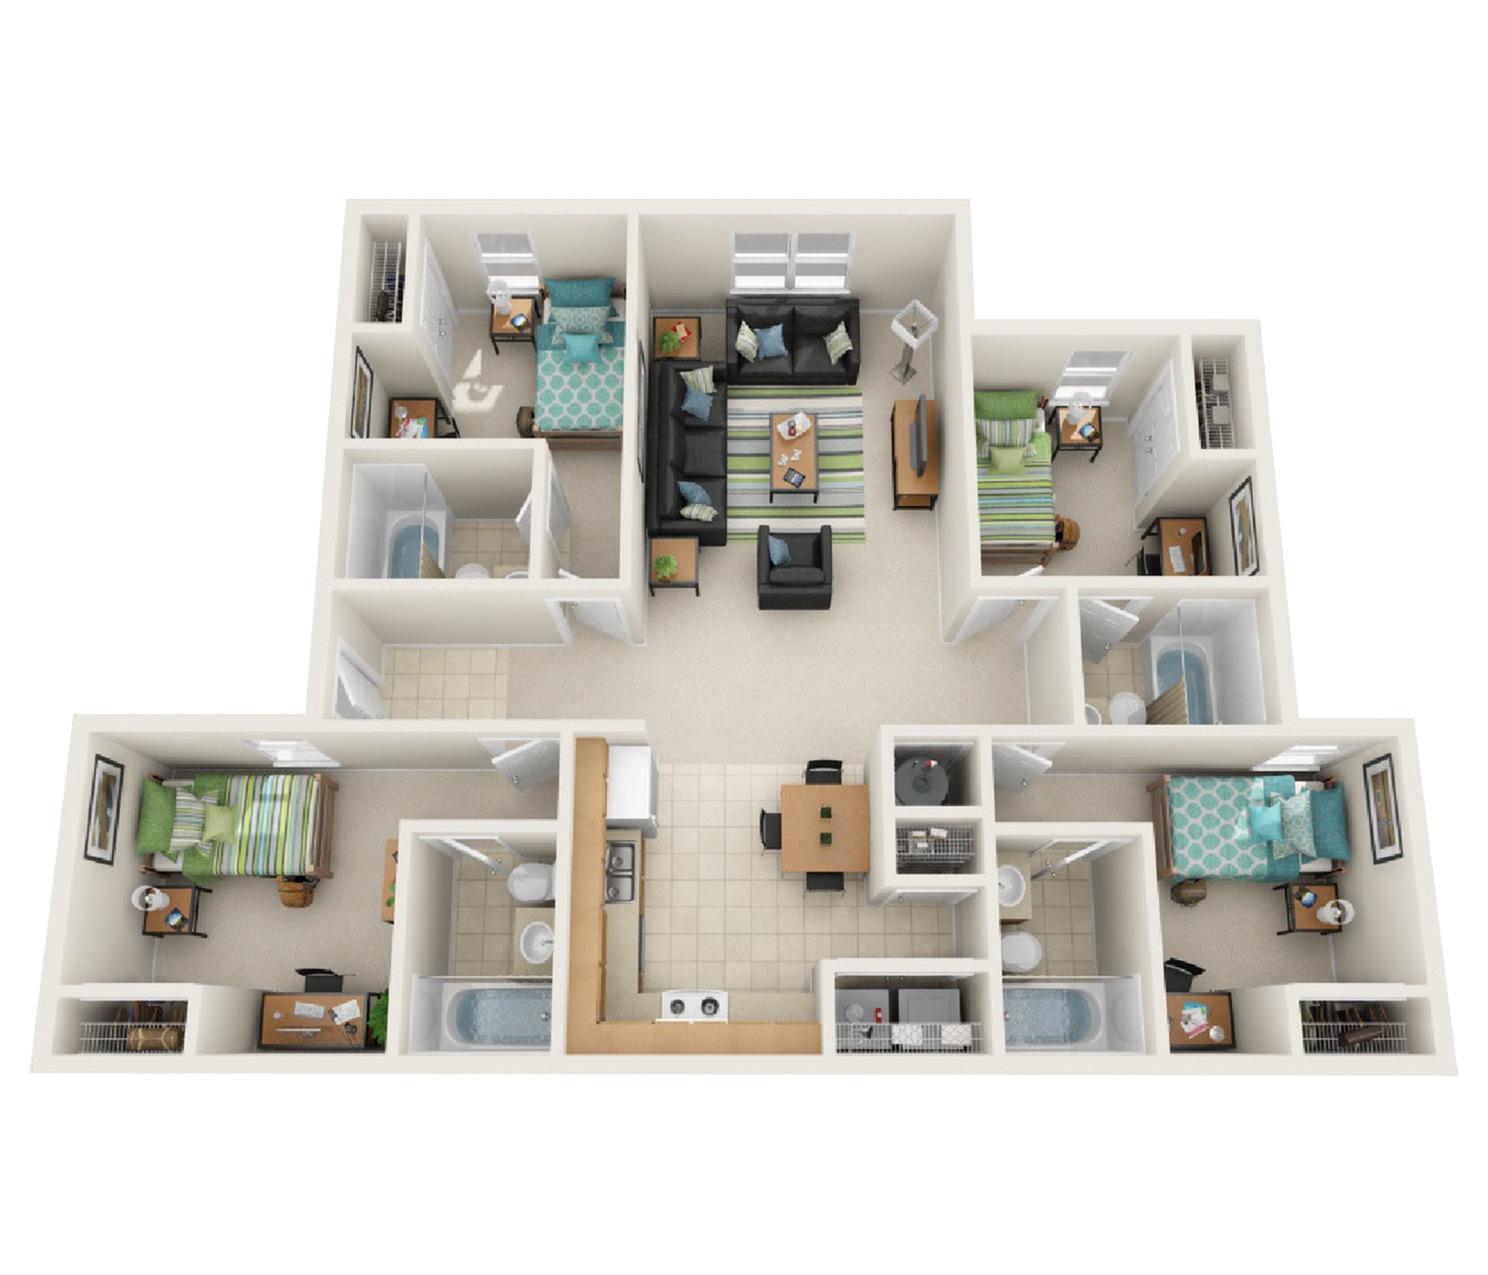 1 4 bed apartments the lowell apartments the lowell apartments